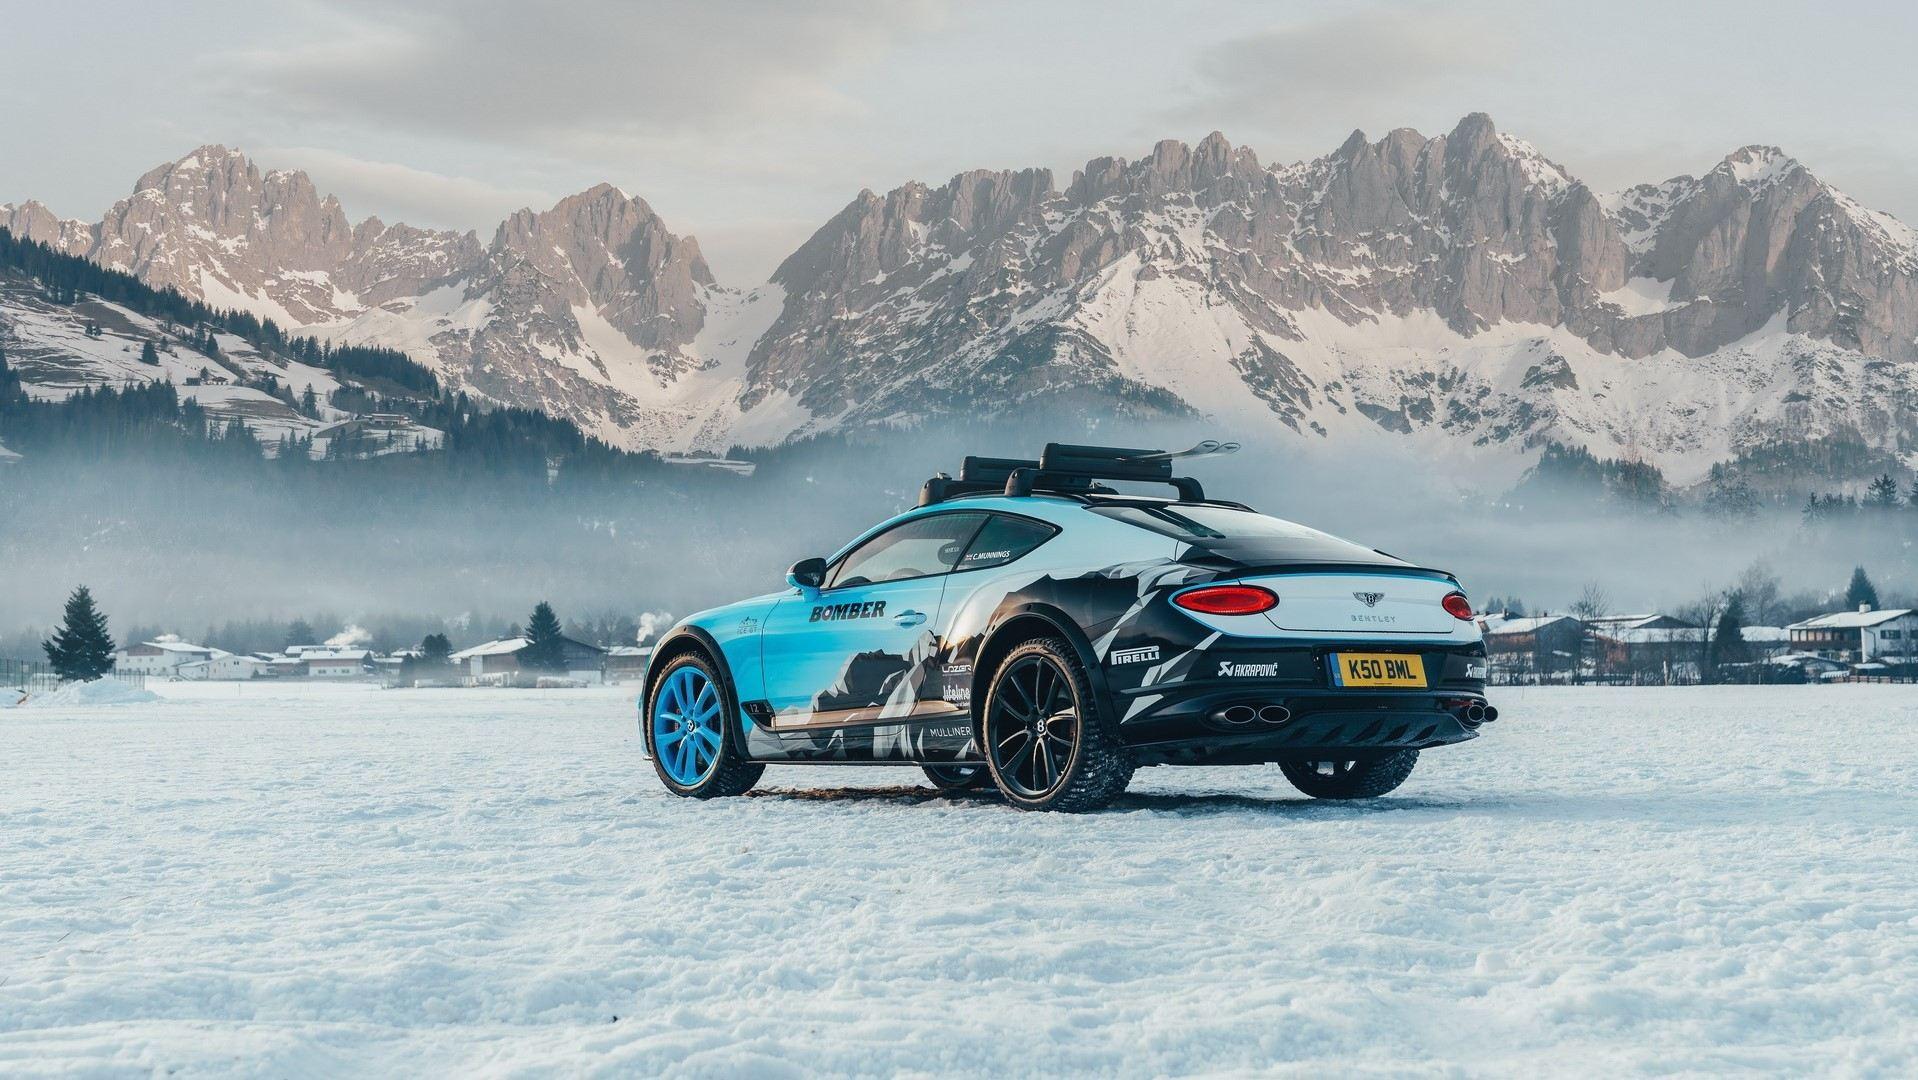 Bentley Continental GT Ice Race 2020 (2)